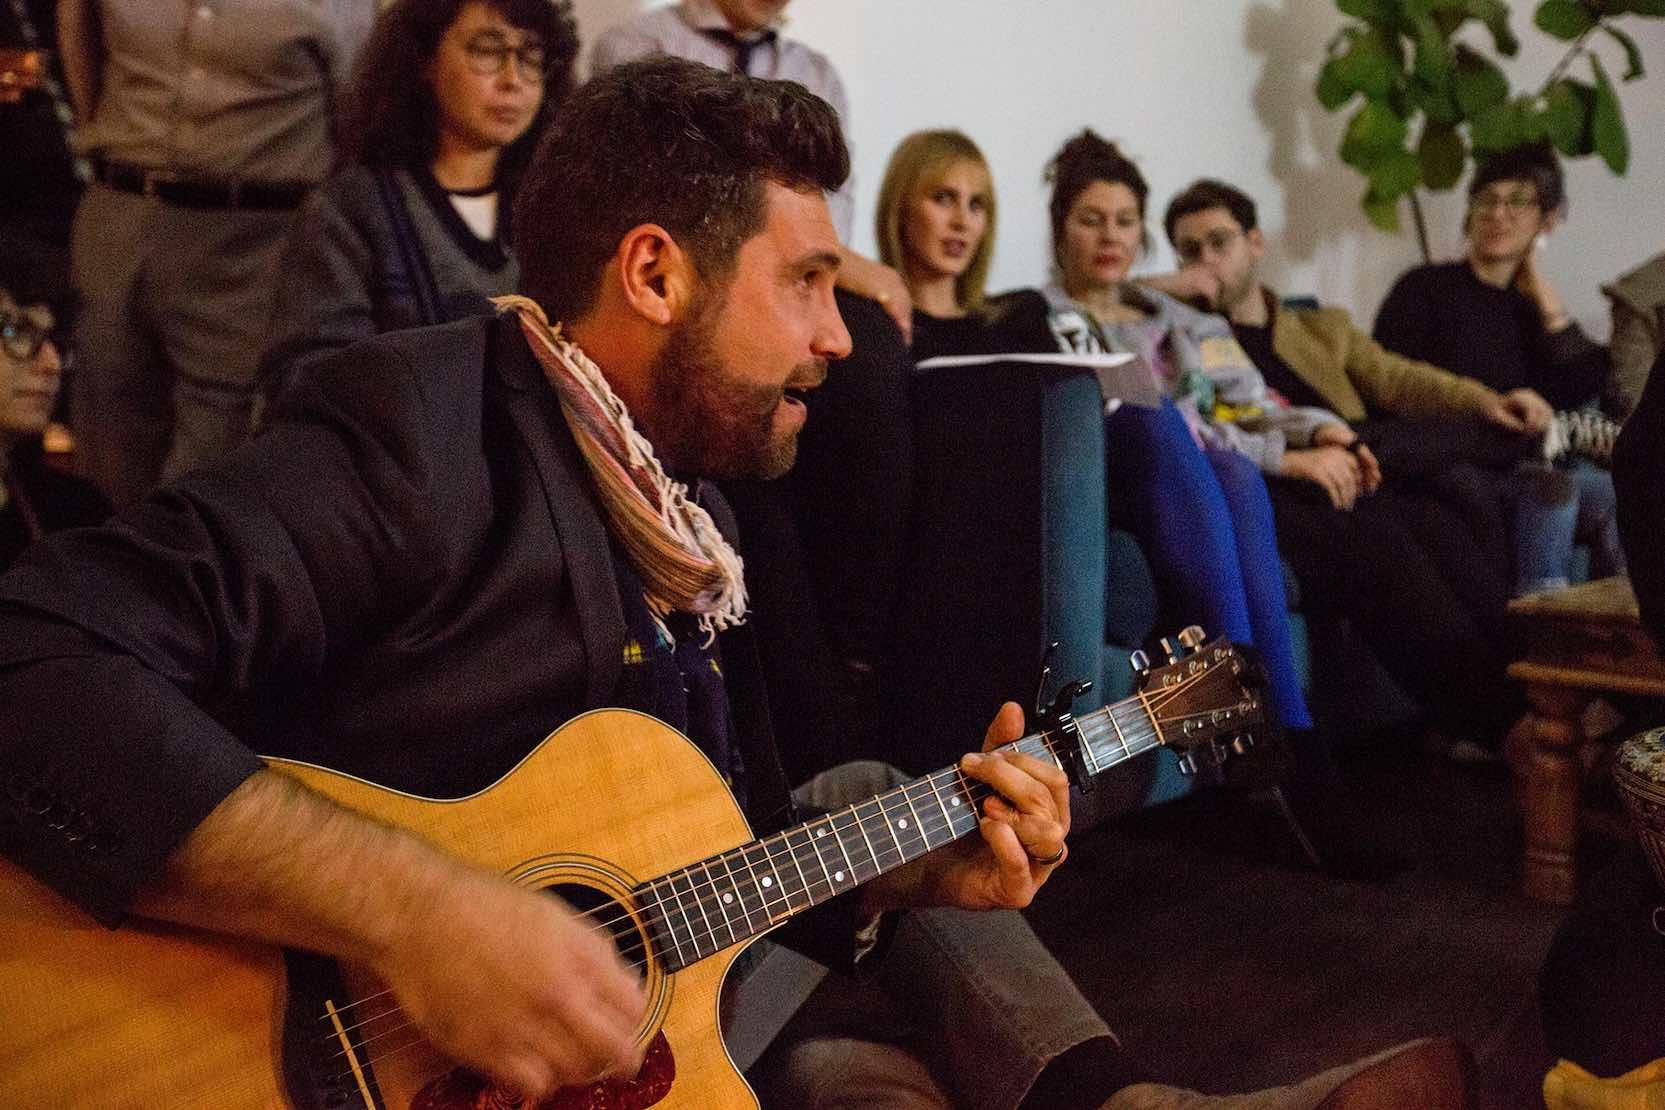 Man plays guitar and sings.